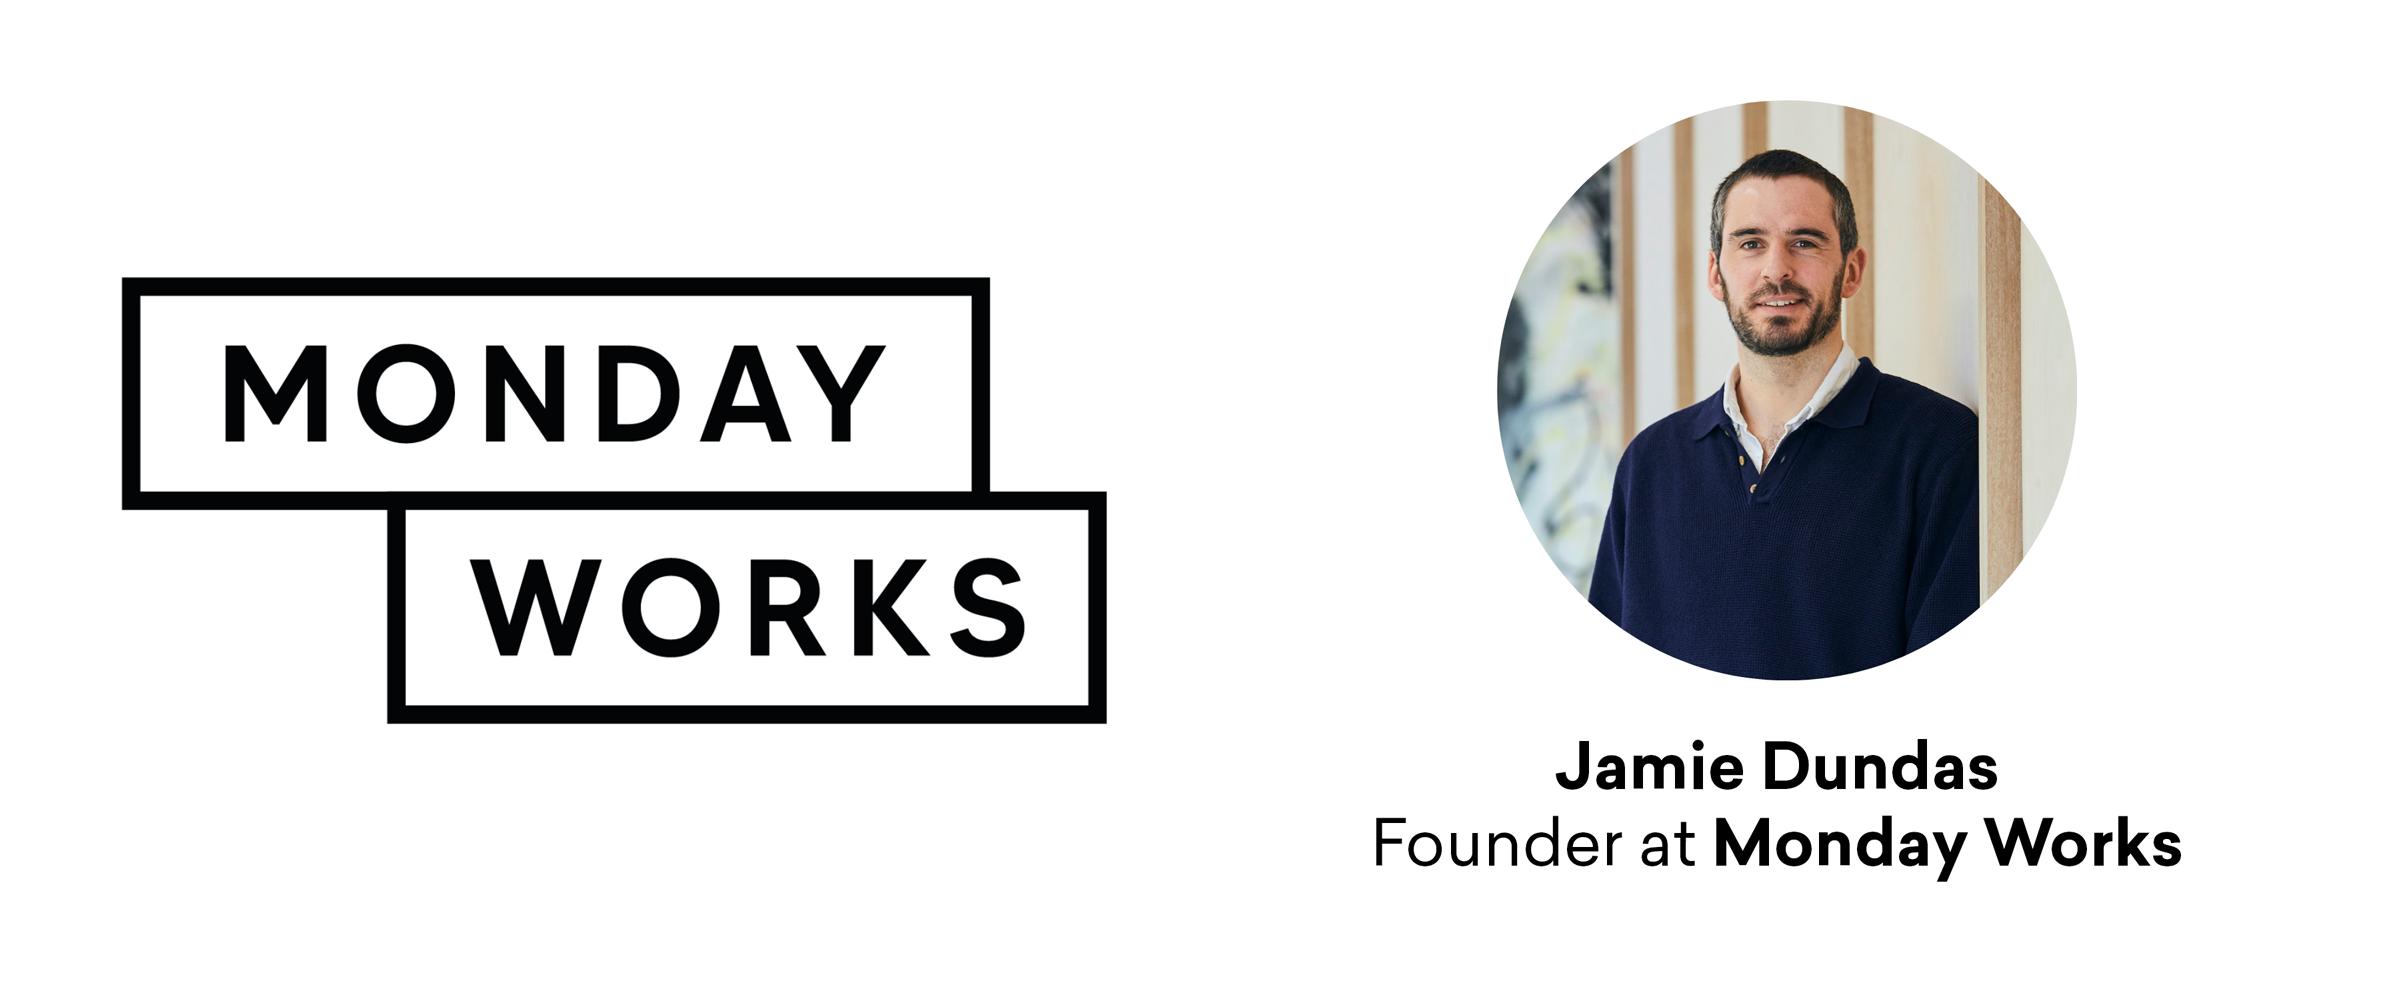 Jamie Dundas, Founder at Monday Works - Brand logo next to headshot and text